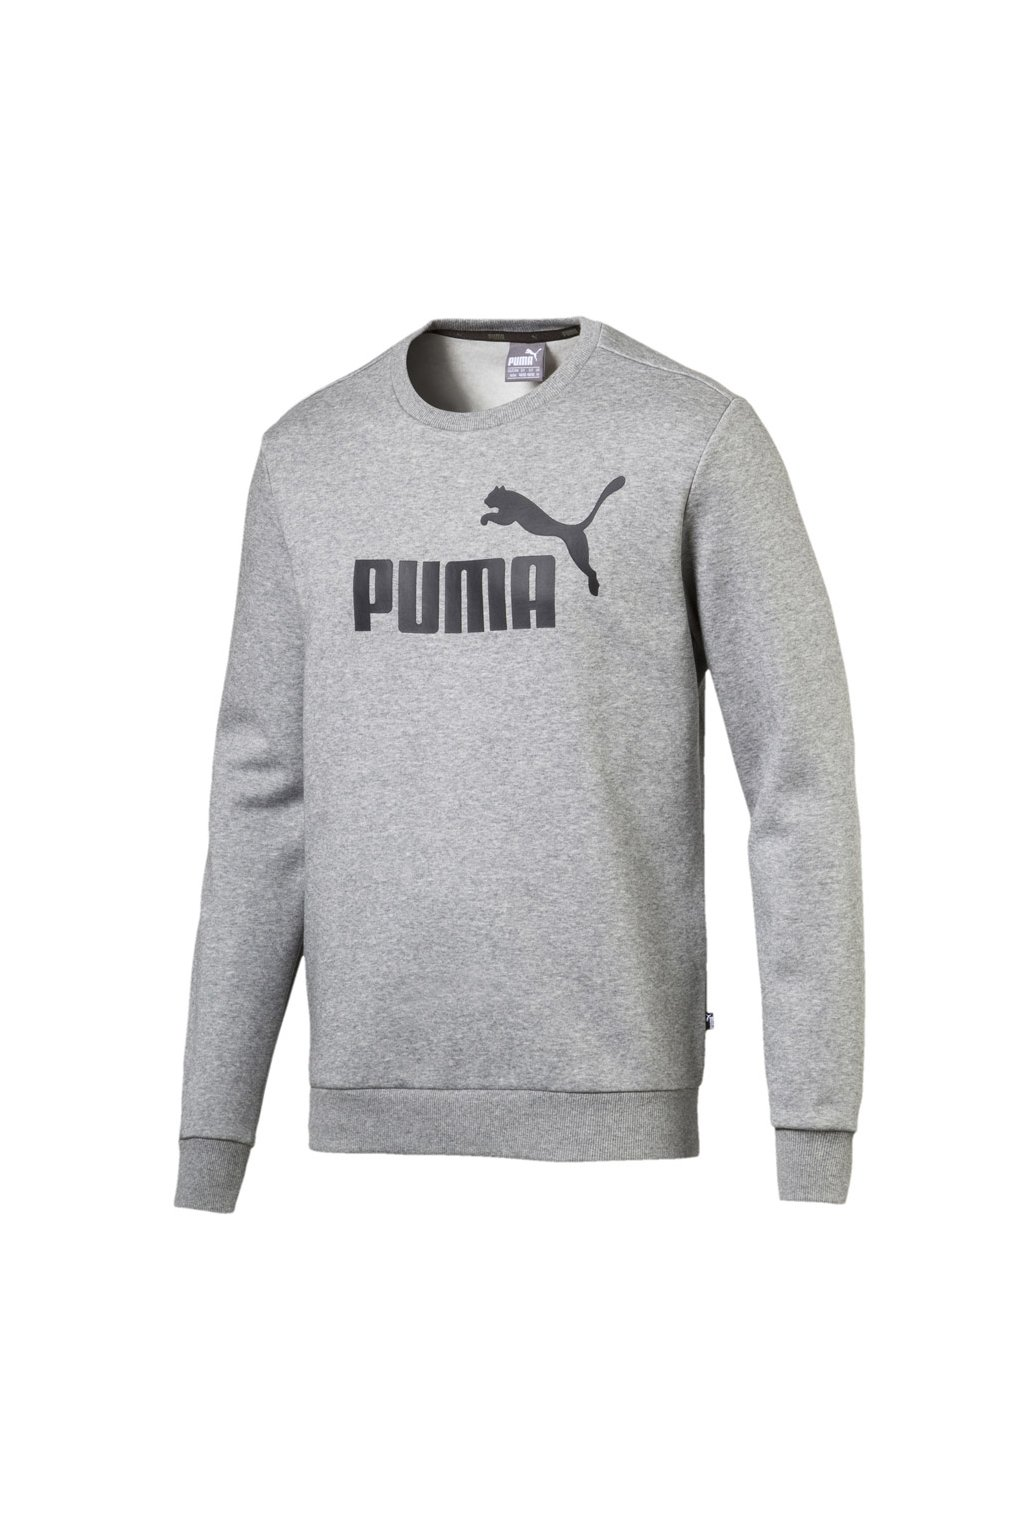 Pánska mikina Puma Essentials Logo Crew Fleece sivá 851747 03